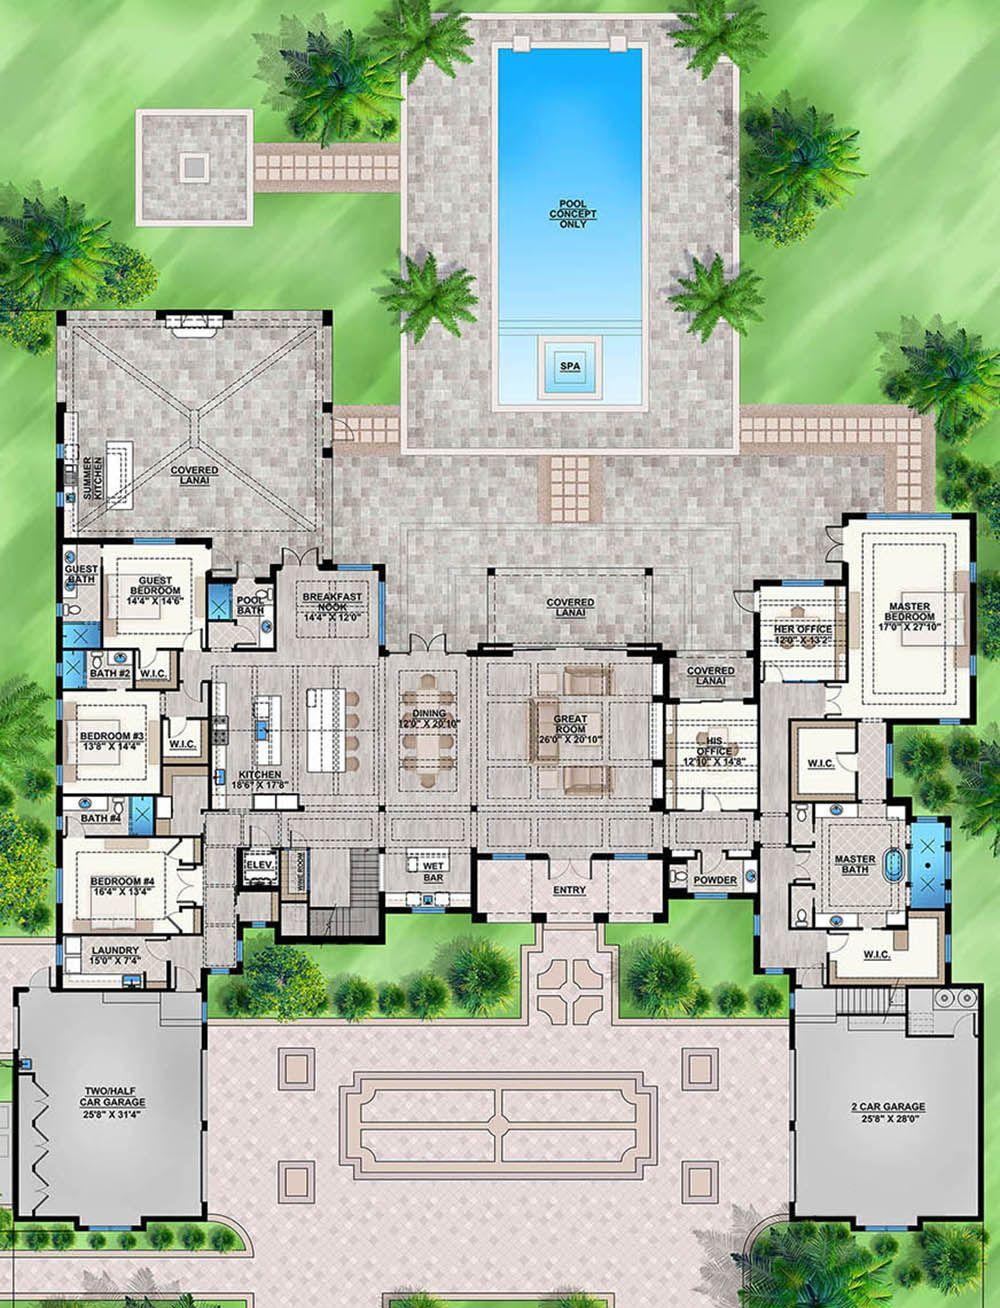 House Plan 20700067 Luxury Plan 8,285 Square Feet, 7